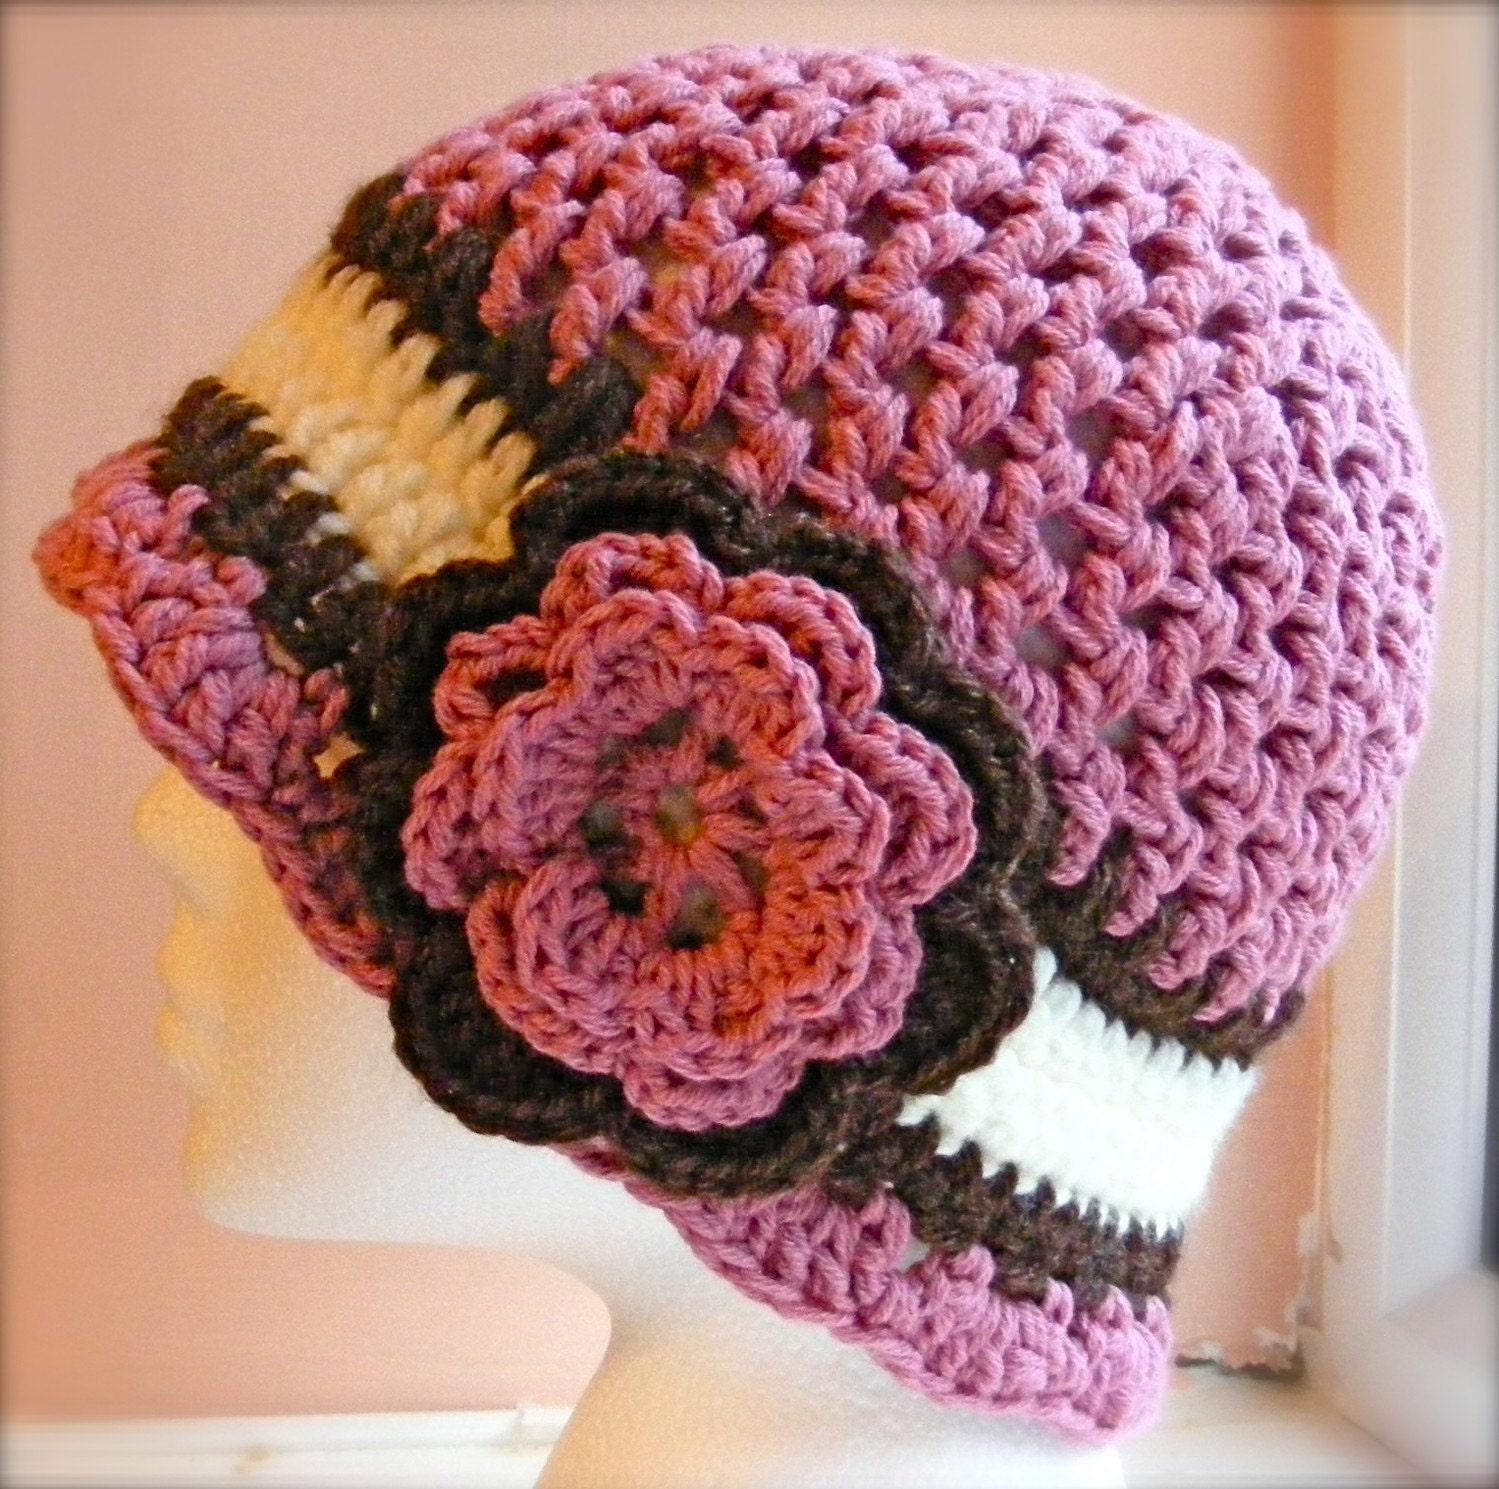 Medium Crochet Flower Pattern : Popular items for american terms on Etsy